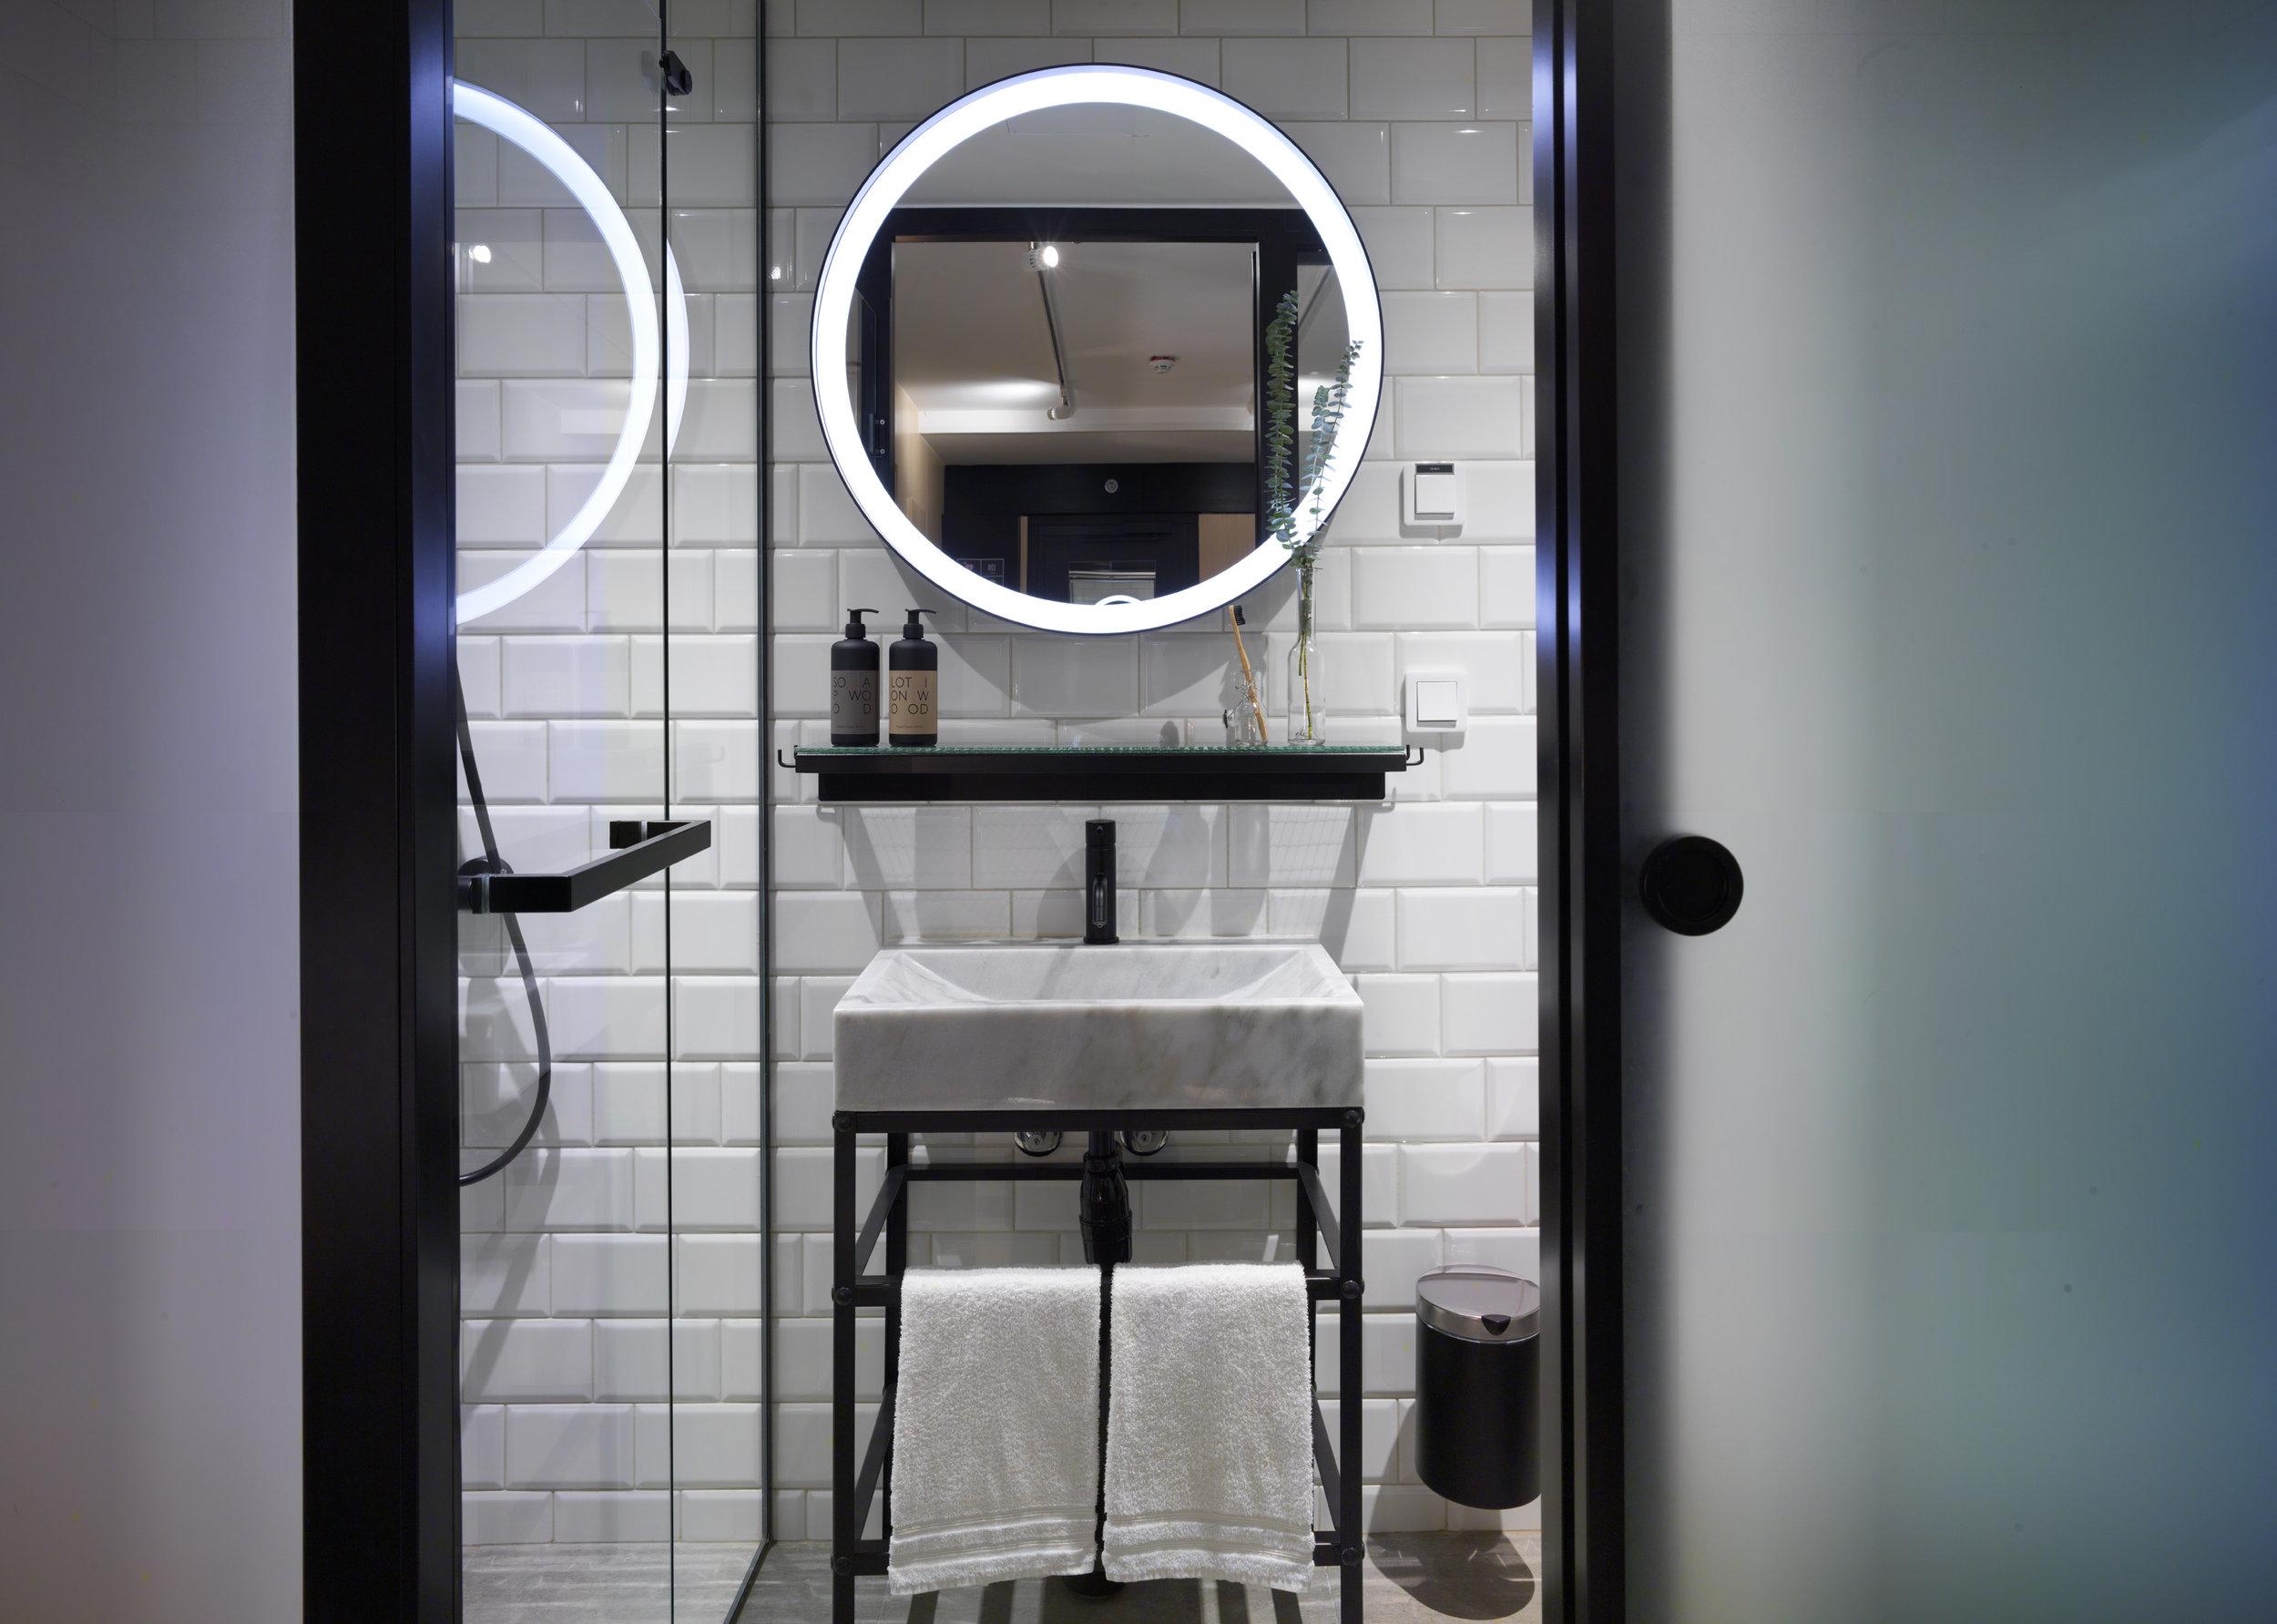 ARK_HotelWith_Bathroom 2.jpg